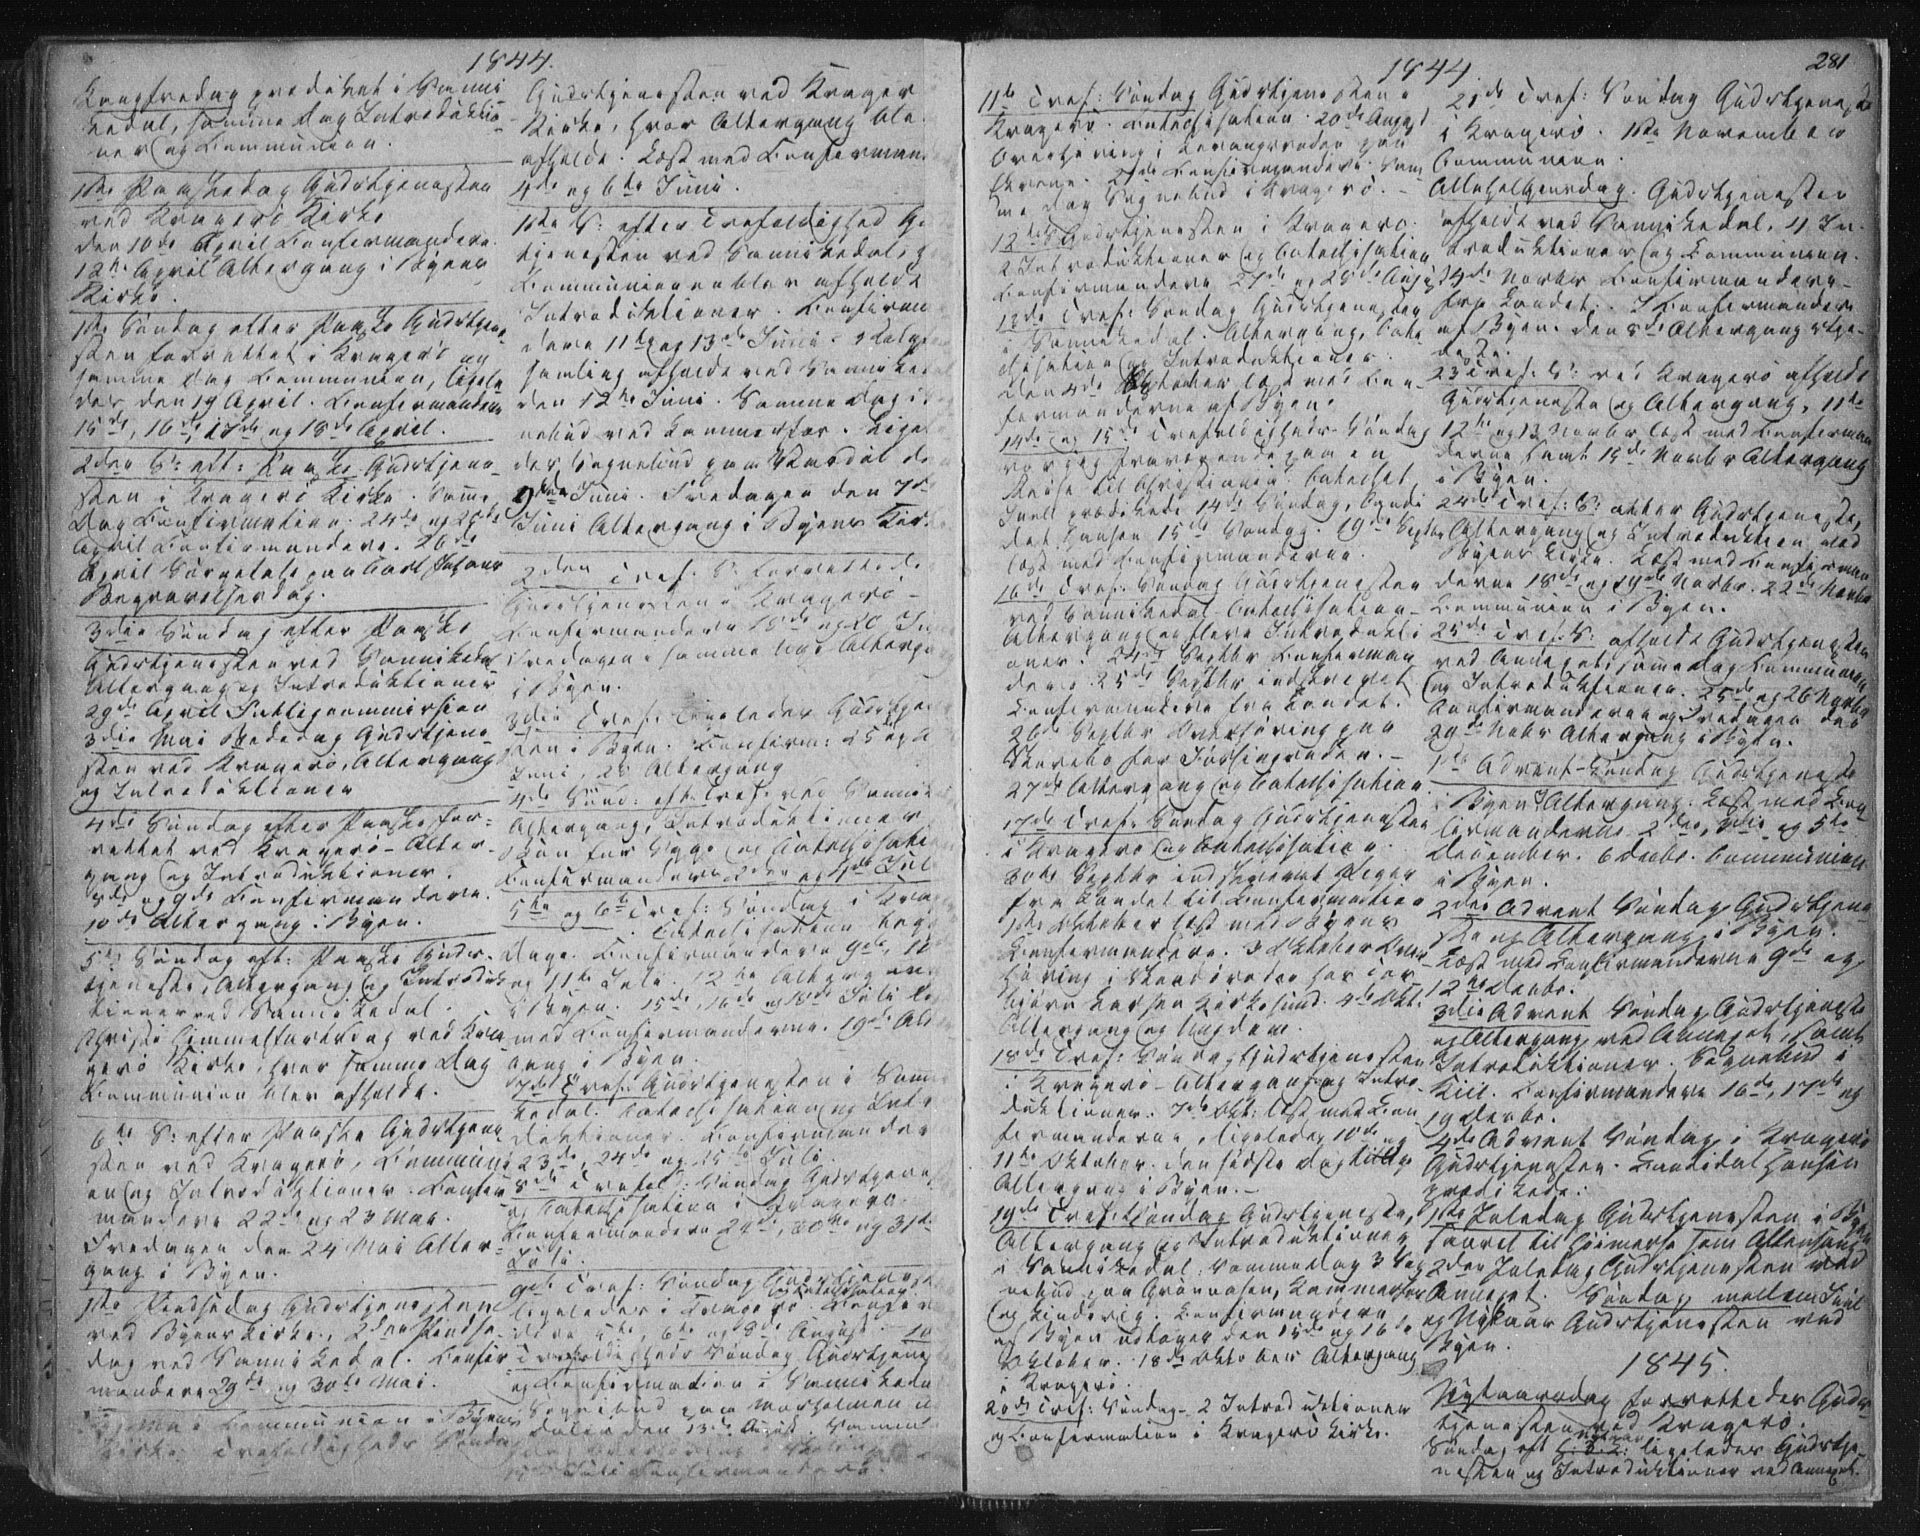 SAKO, Kragerø kirkebøker, F/Fa/L0005: Ministerialbok nr. 5, 1832-1847, s. 281